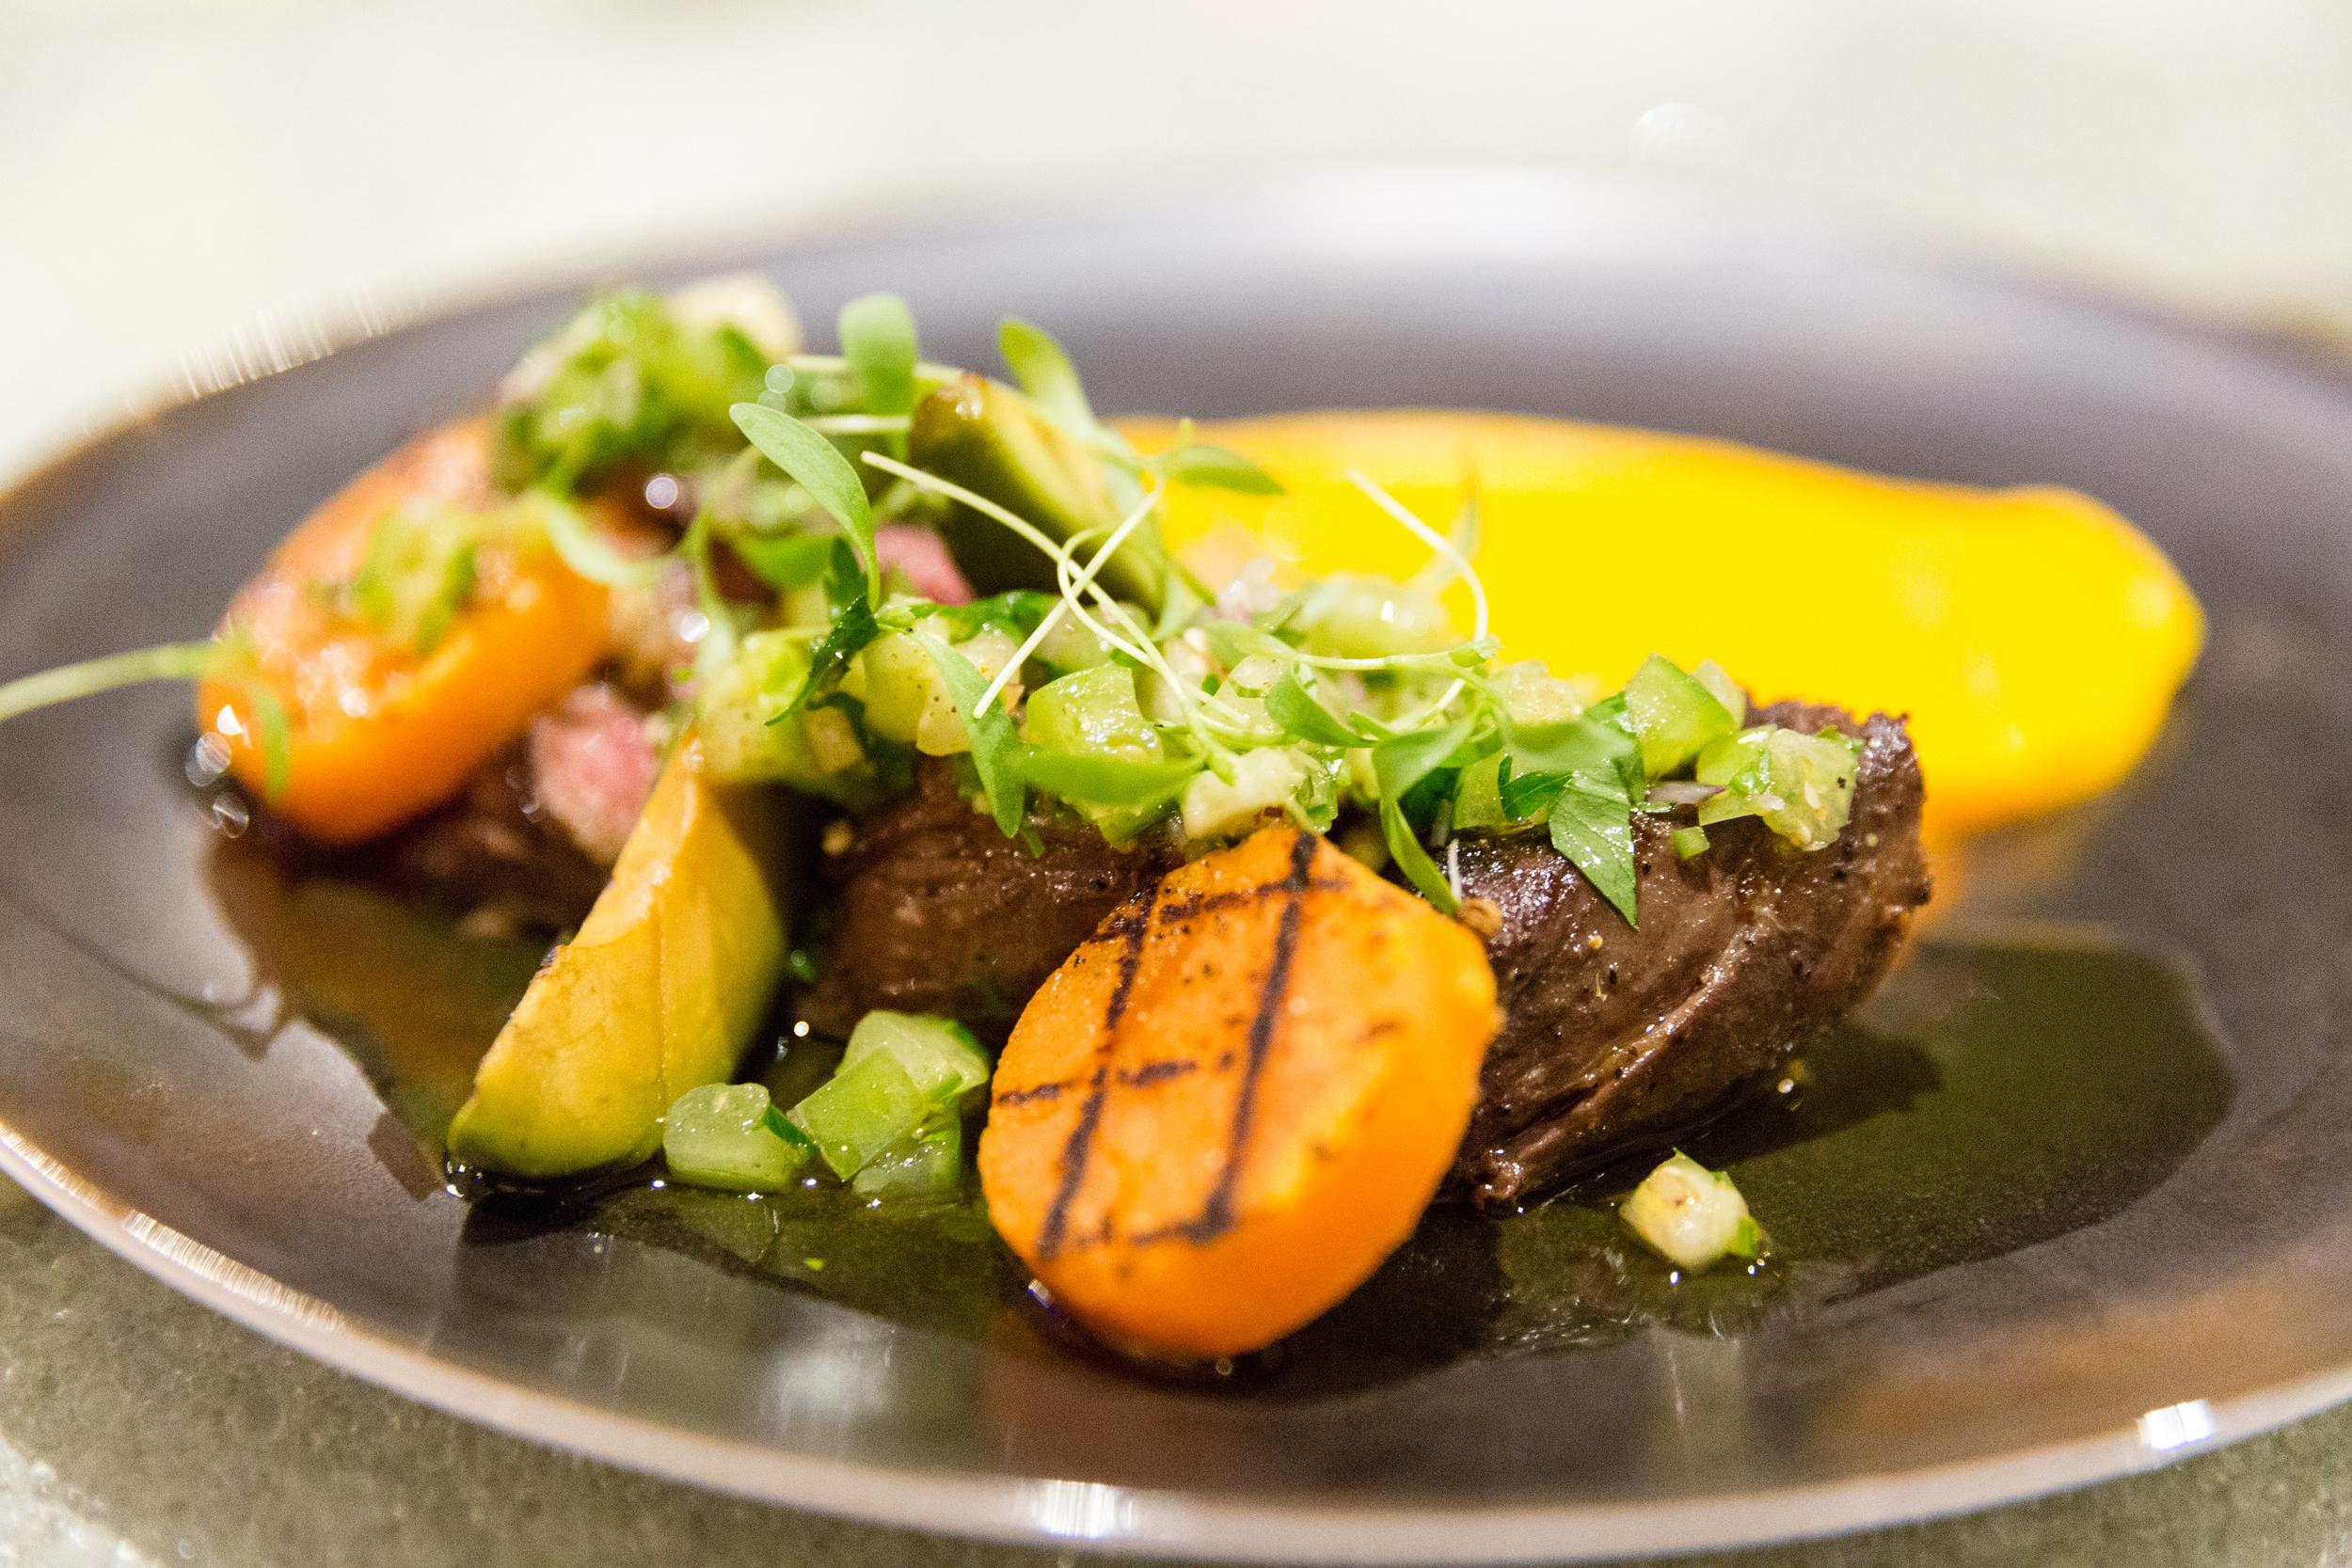 Grilled Wagyu Hanger Steak, Sweet Potato, Avocado and Salsa Verde